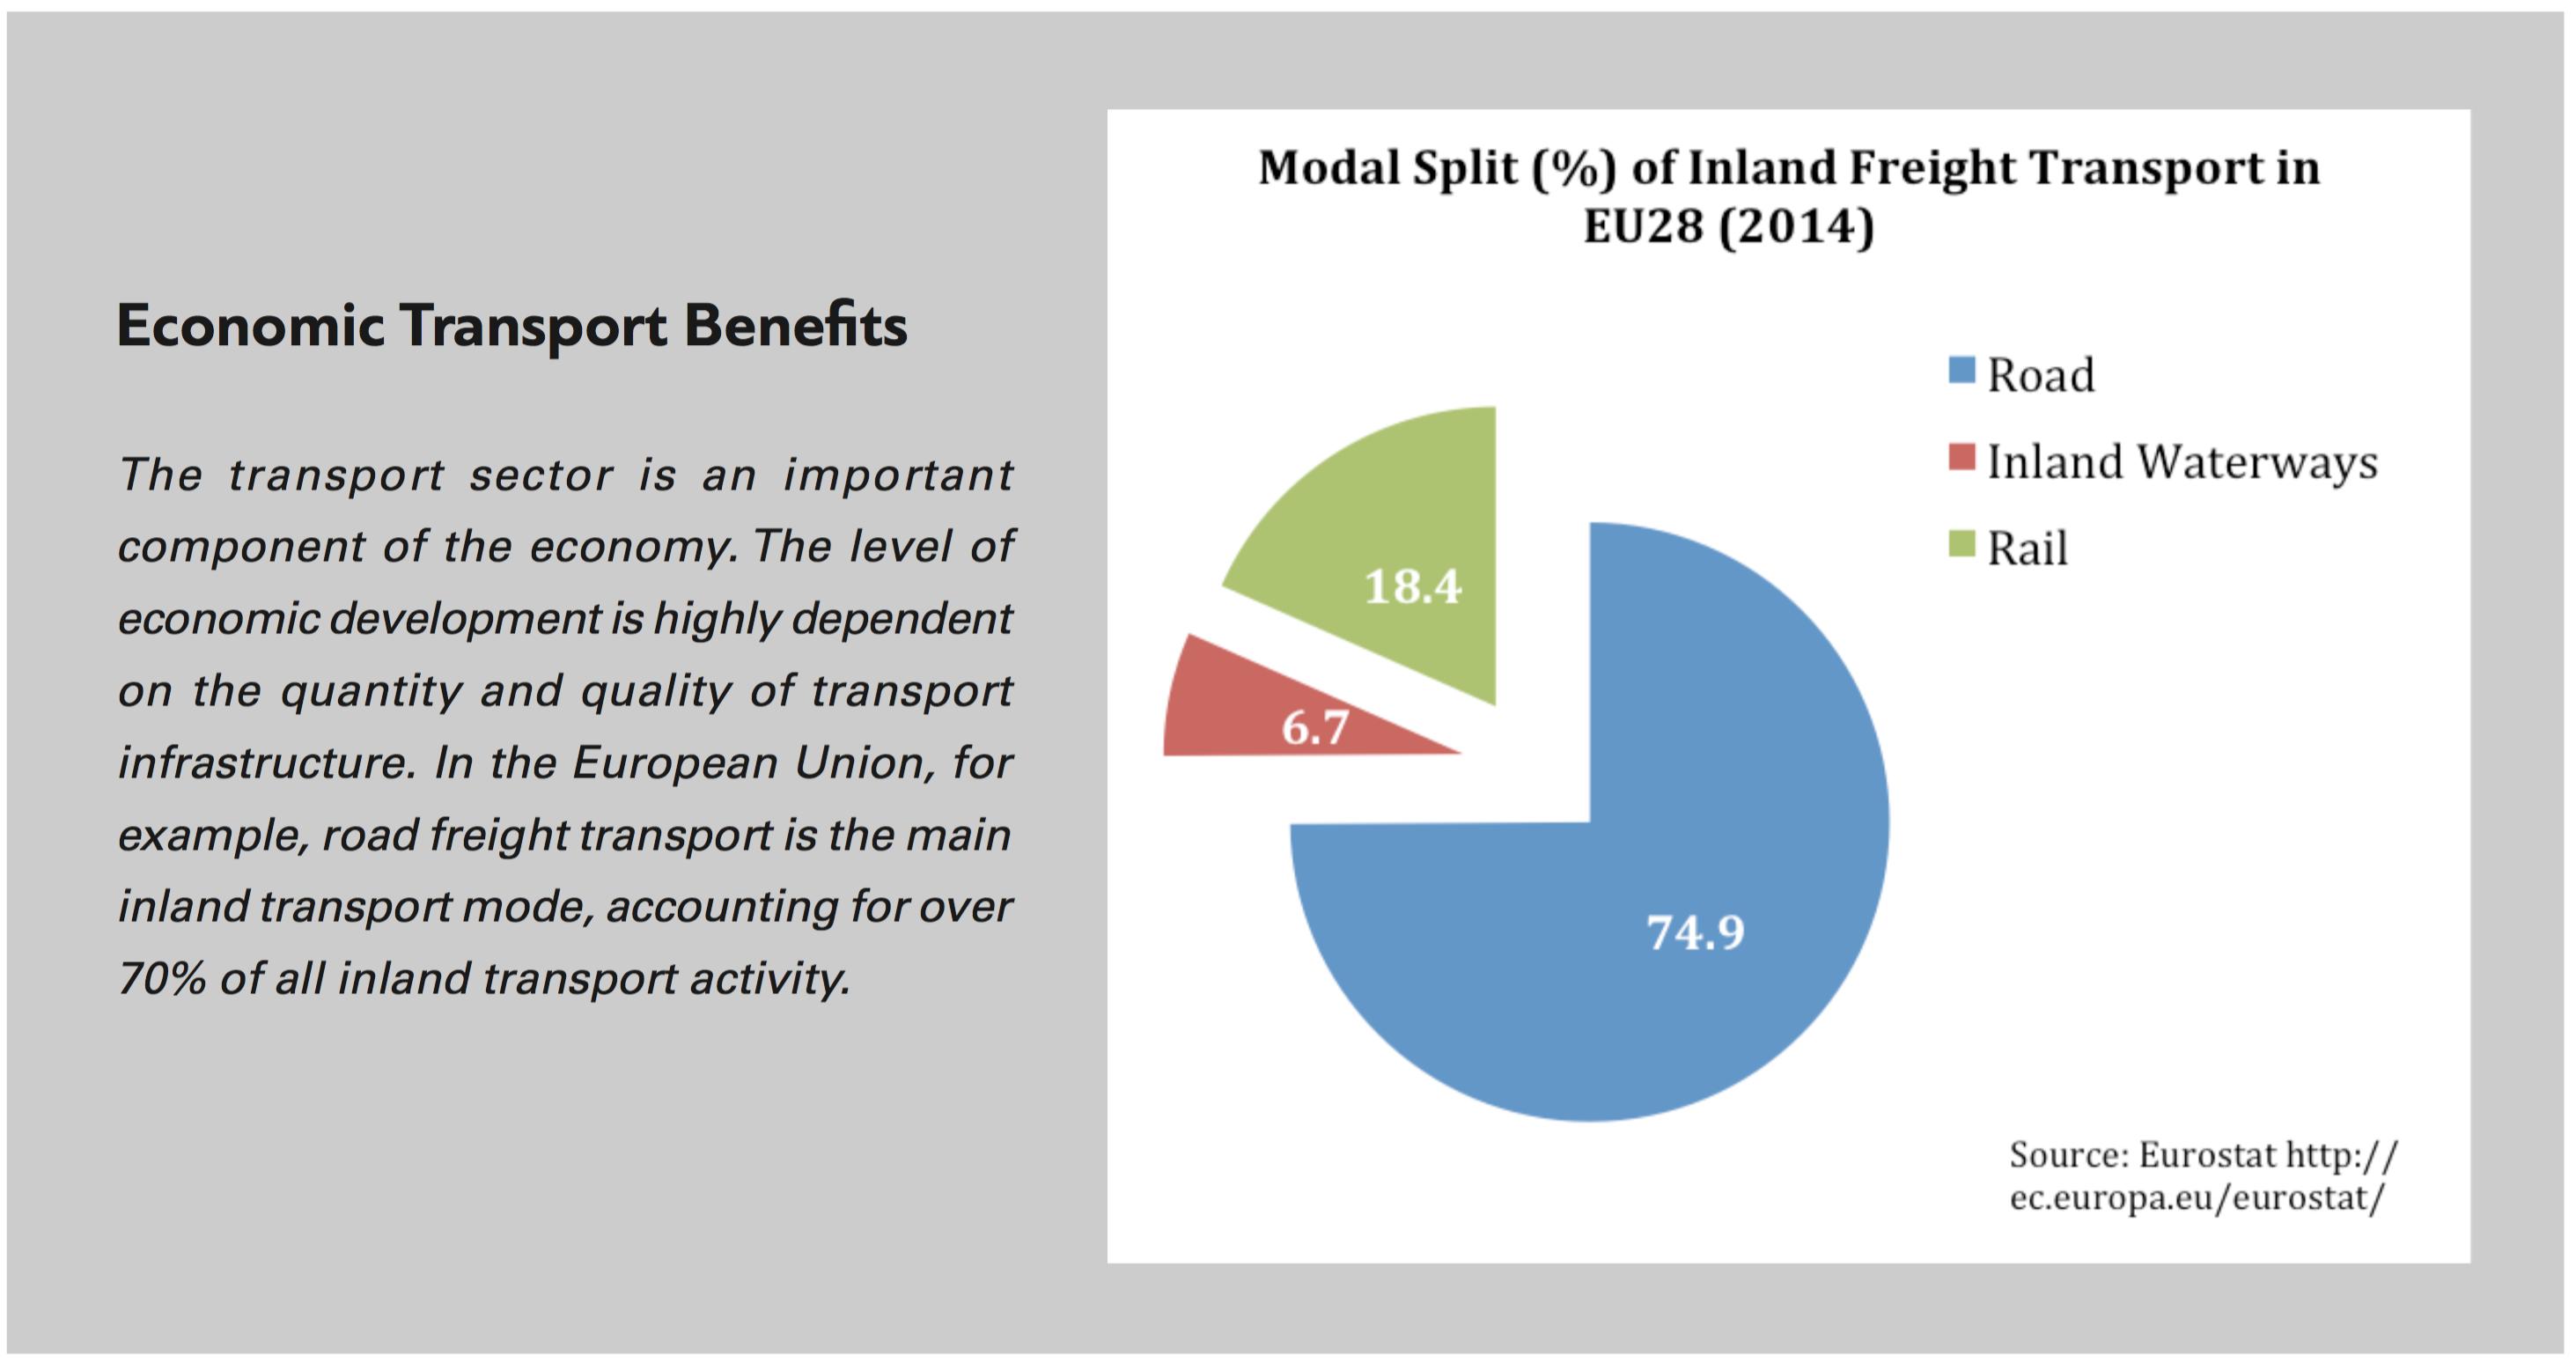 Economic Transport Benefits